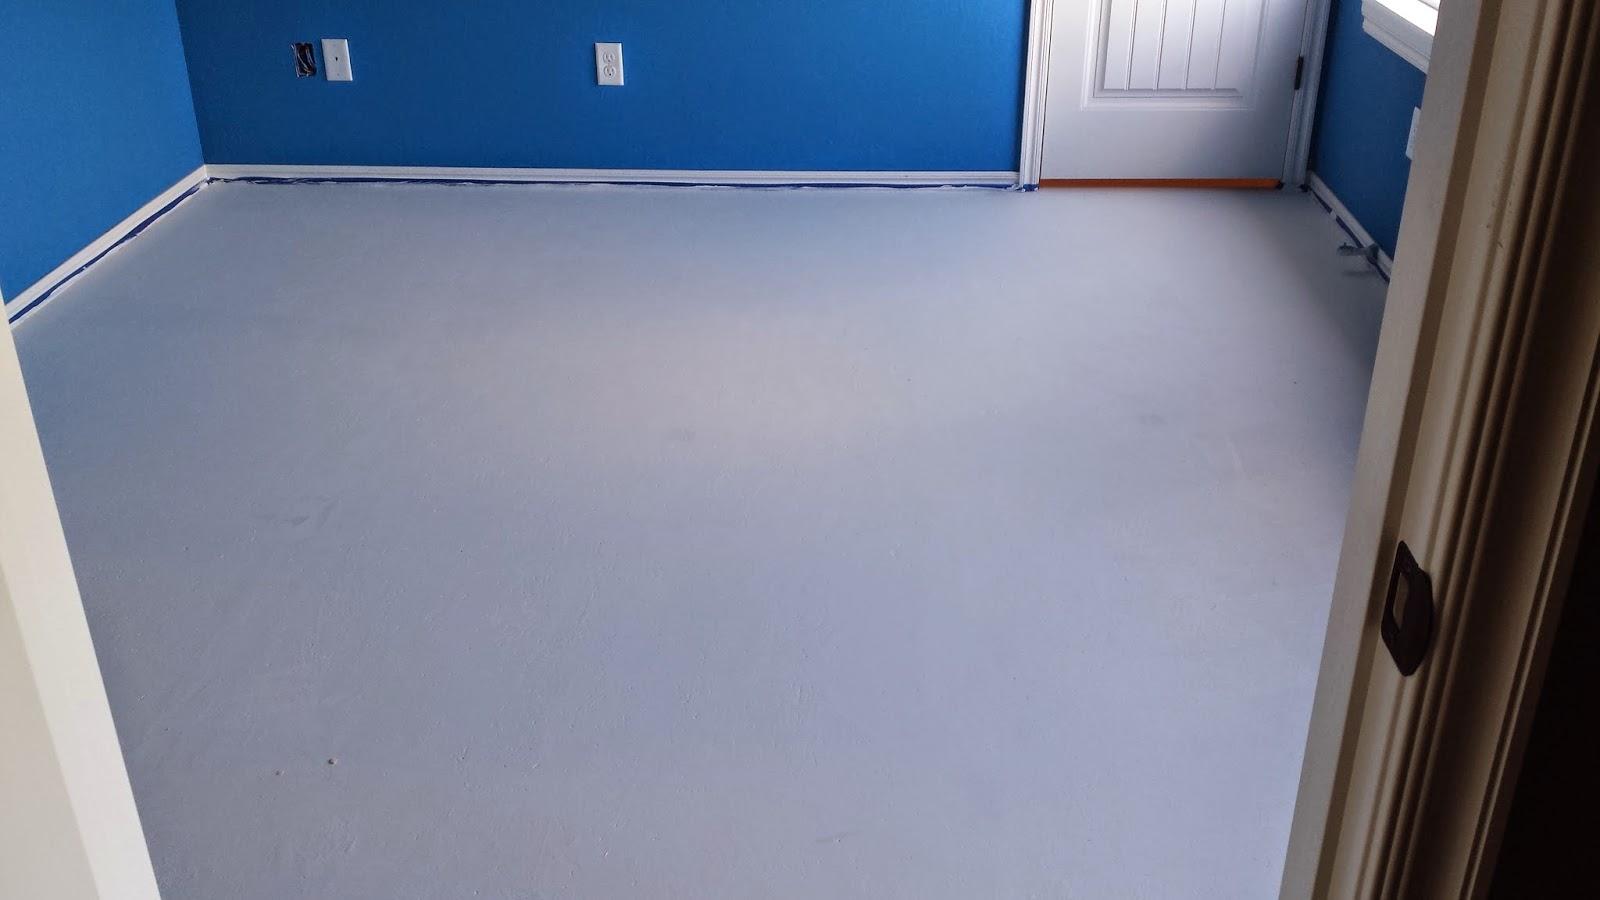 Painted Plywood Subfloor